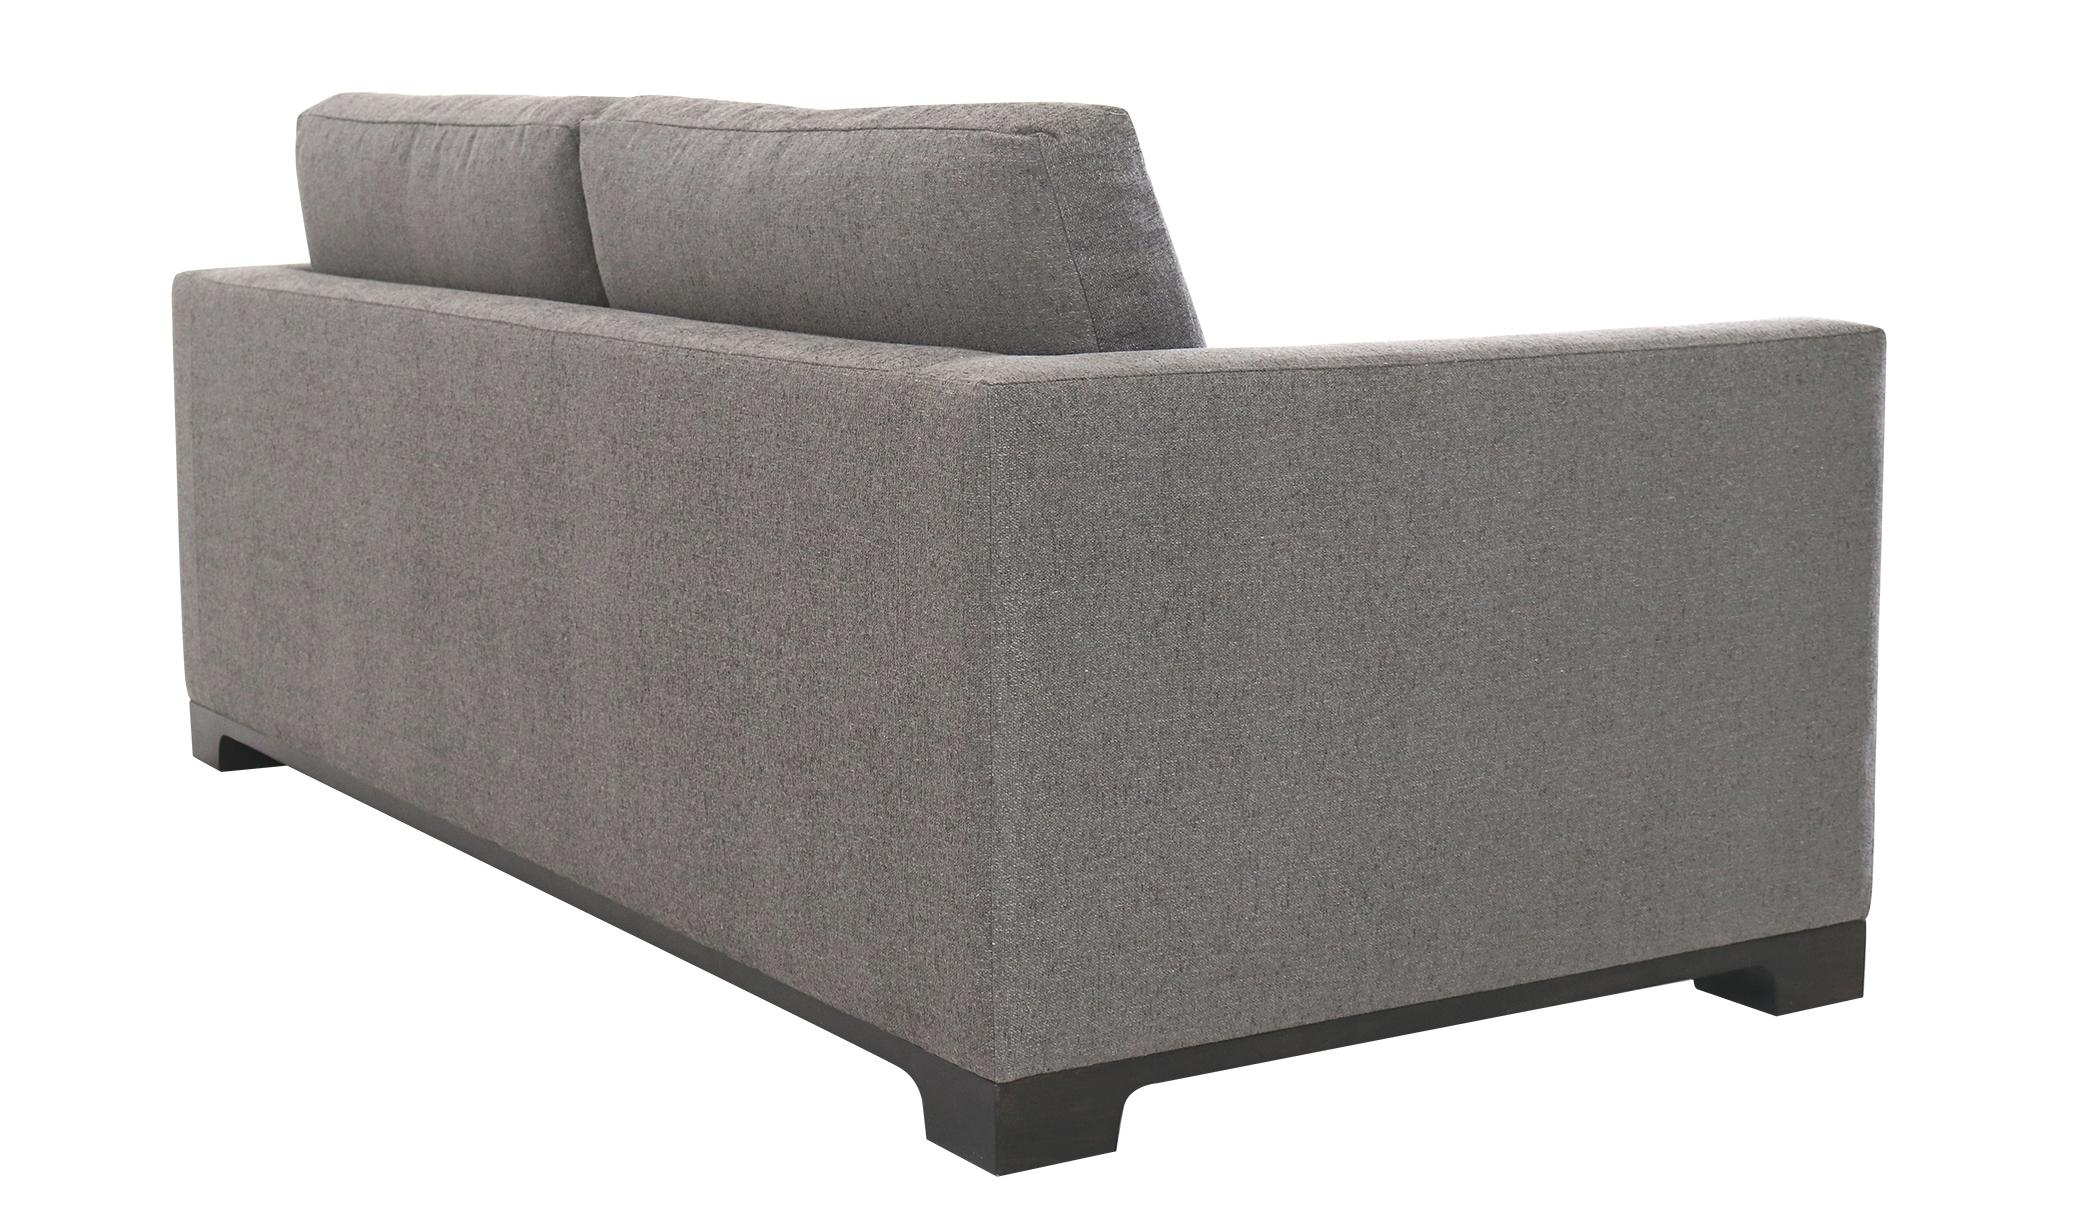 Sensational Bachelor Sofa Arden Home Machost Co Dining Chair Design Ideas Machostcouk